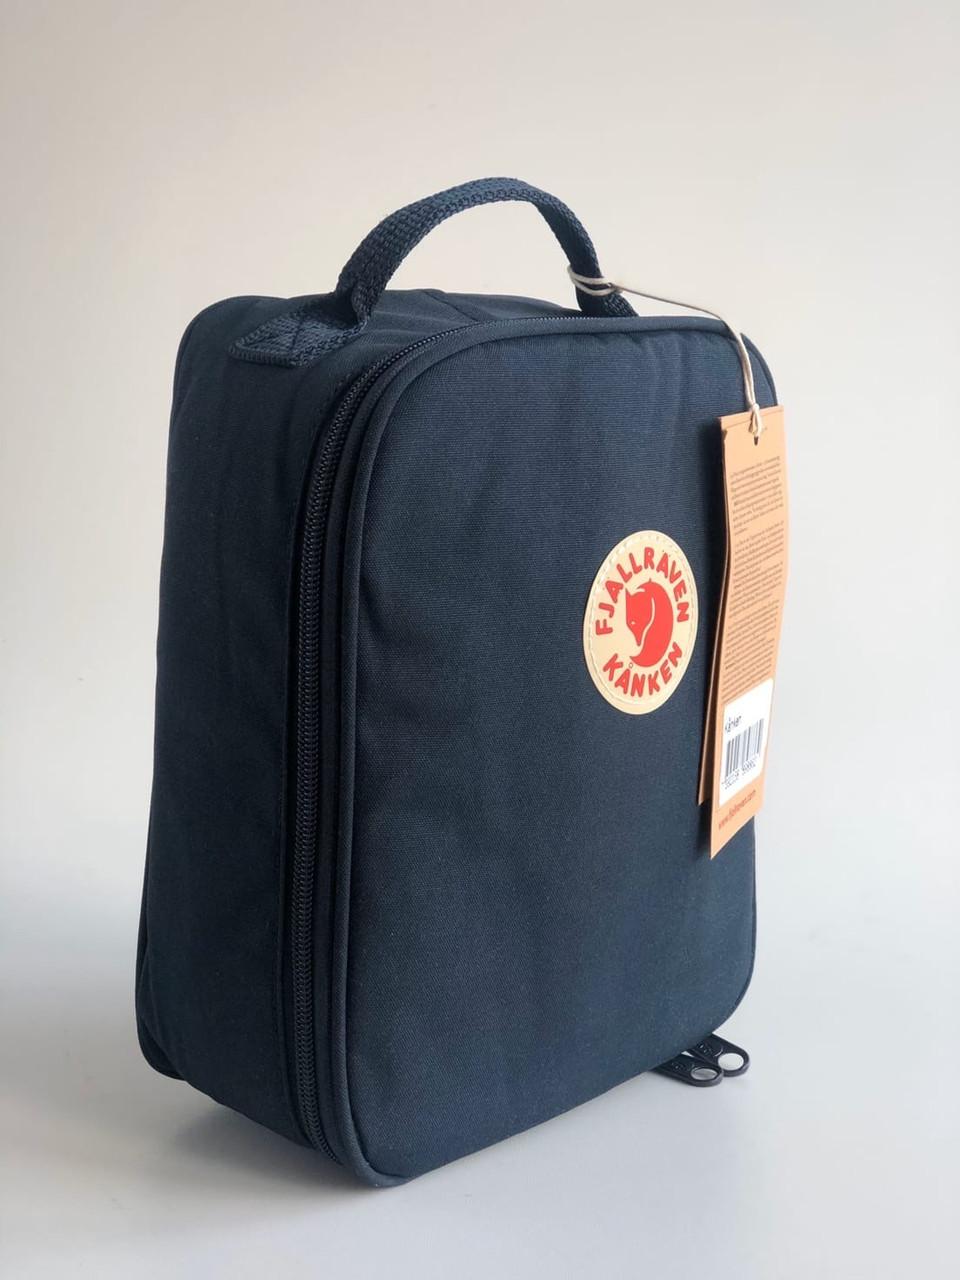 Термо сумка Fjällräven Kanken blue